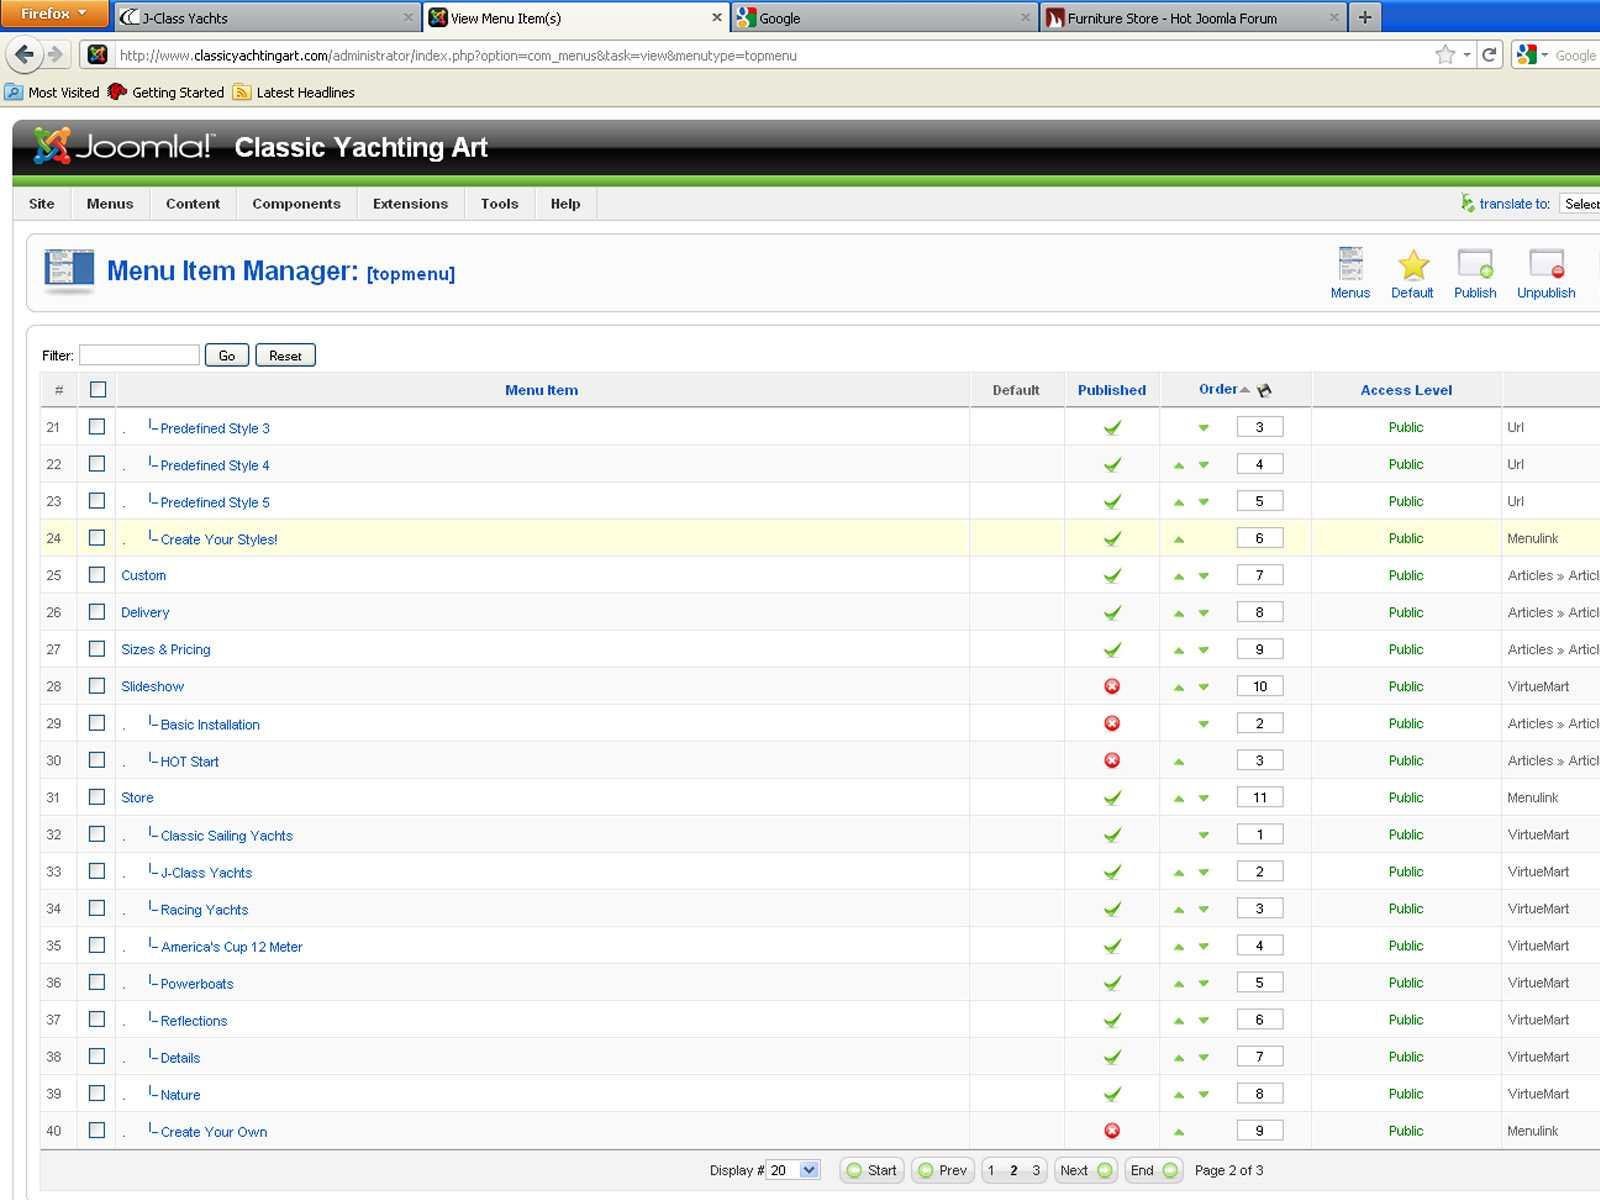 Menu_item_managercopy.jpg